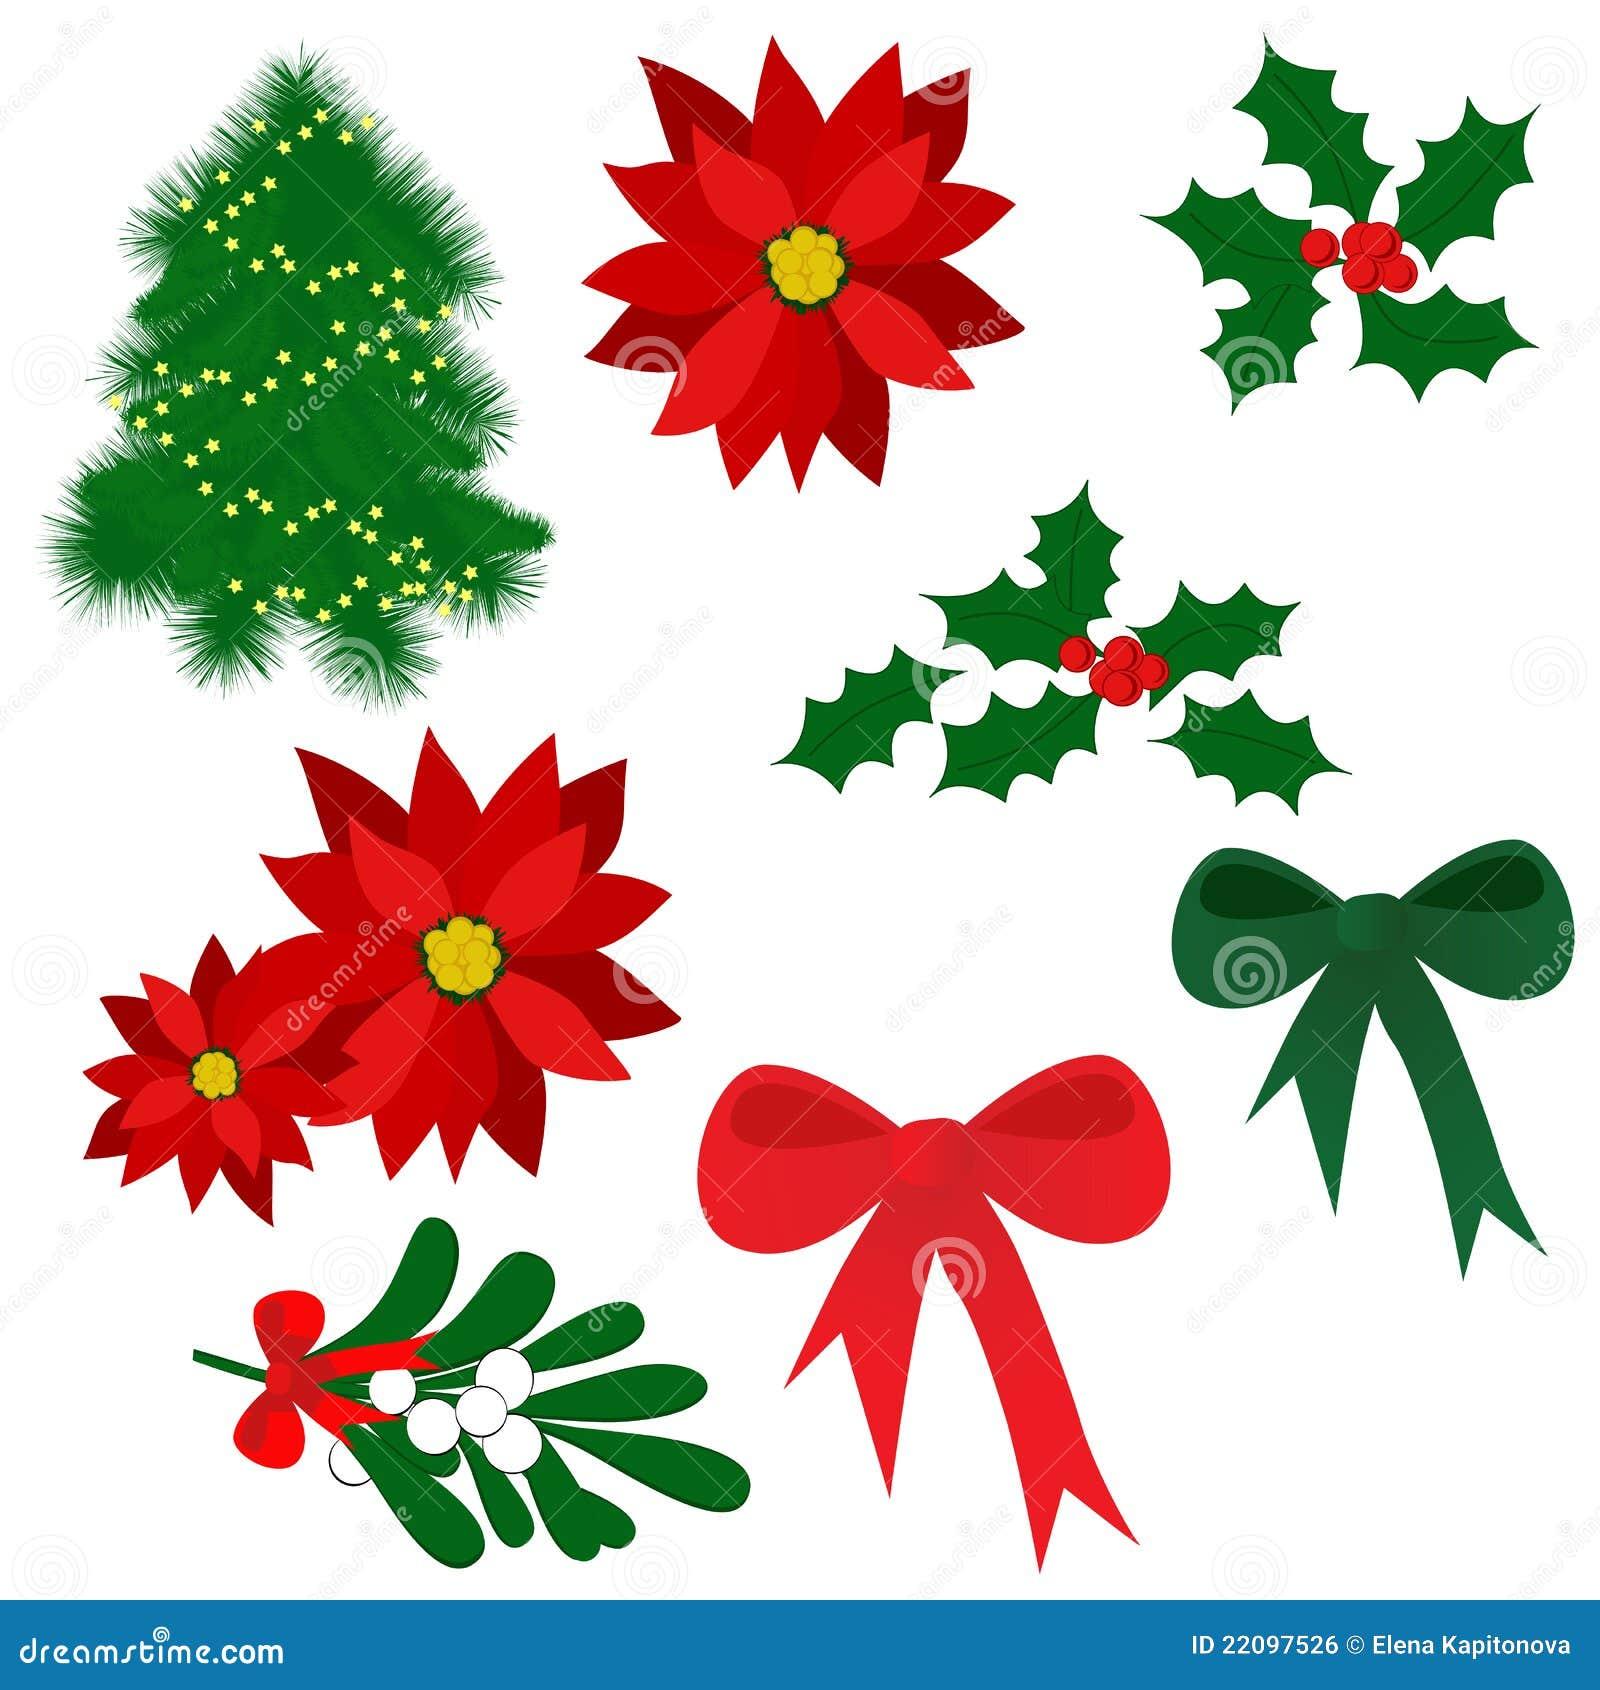 Meaning Of Christmas Tree Symbol: Christmas Symbols Royalty Free Stock Image